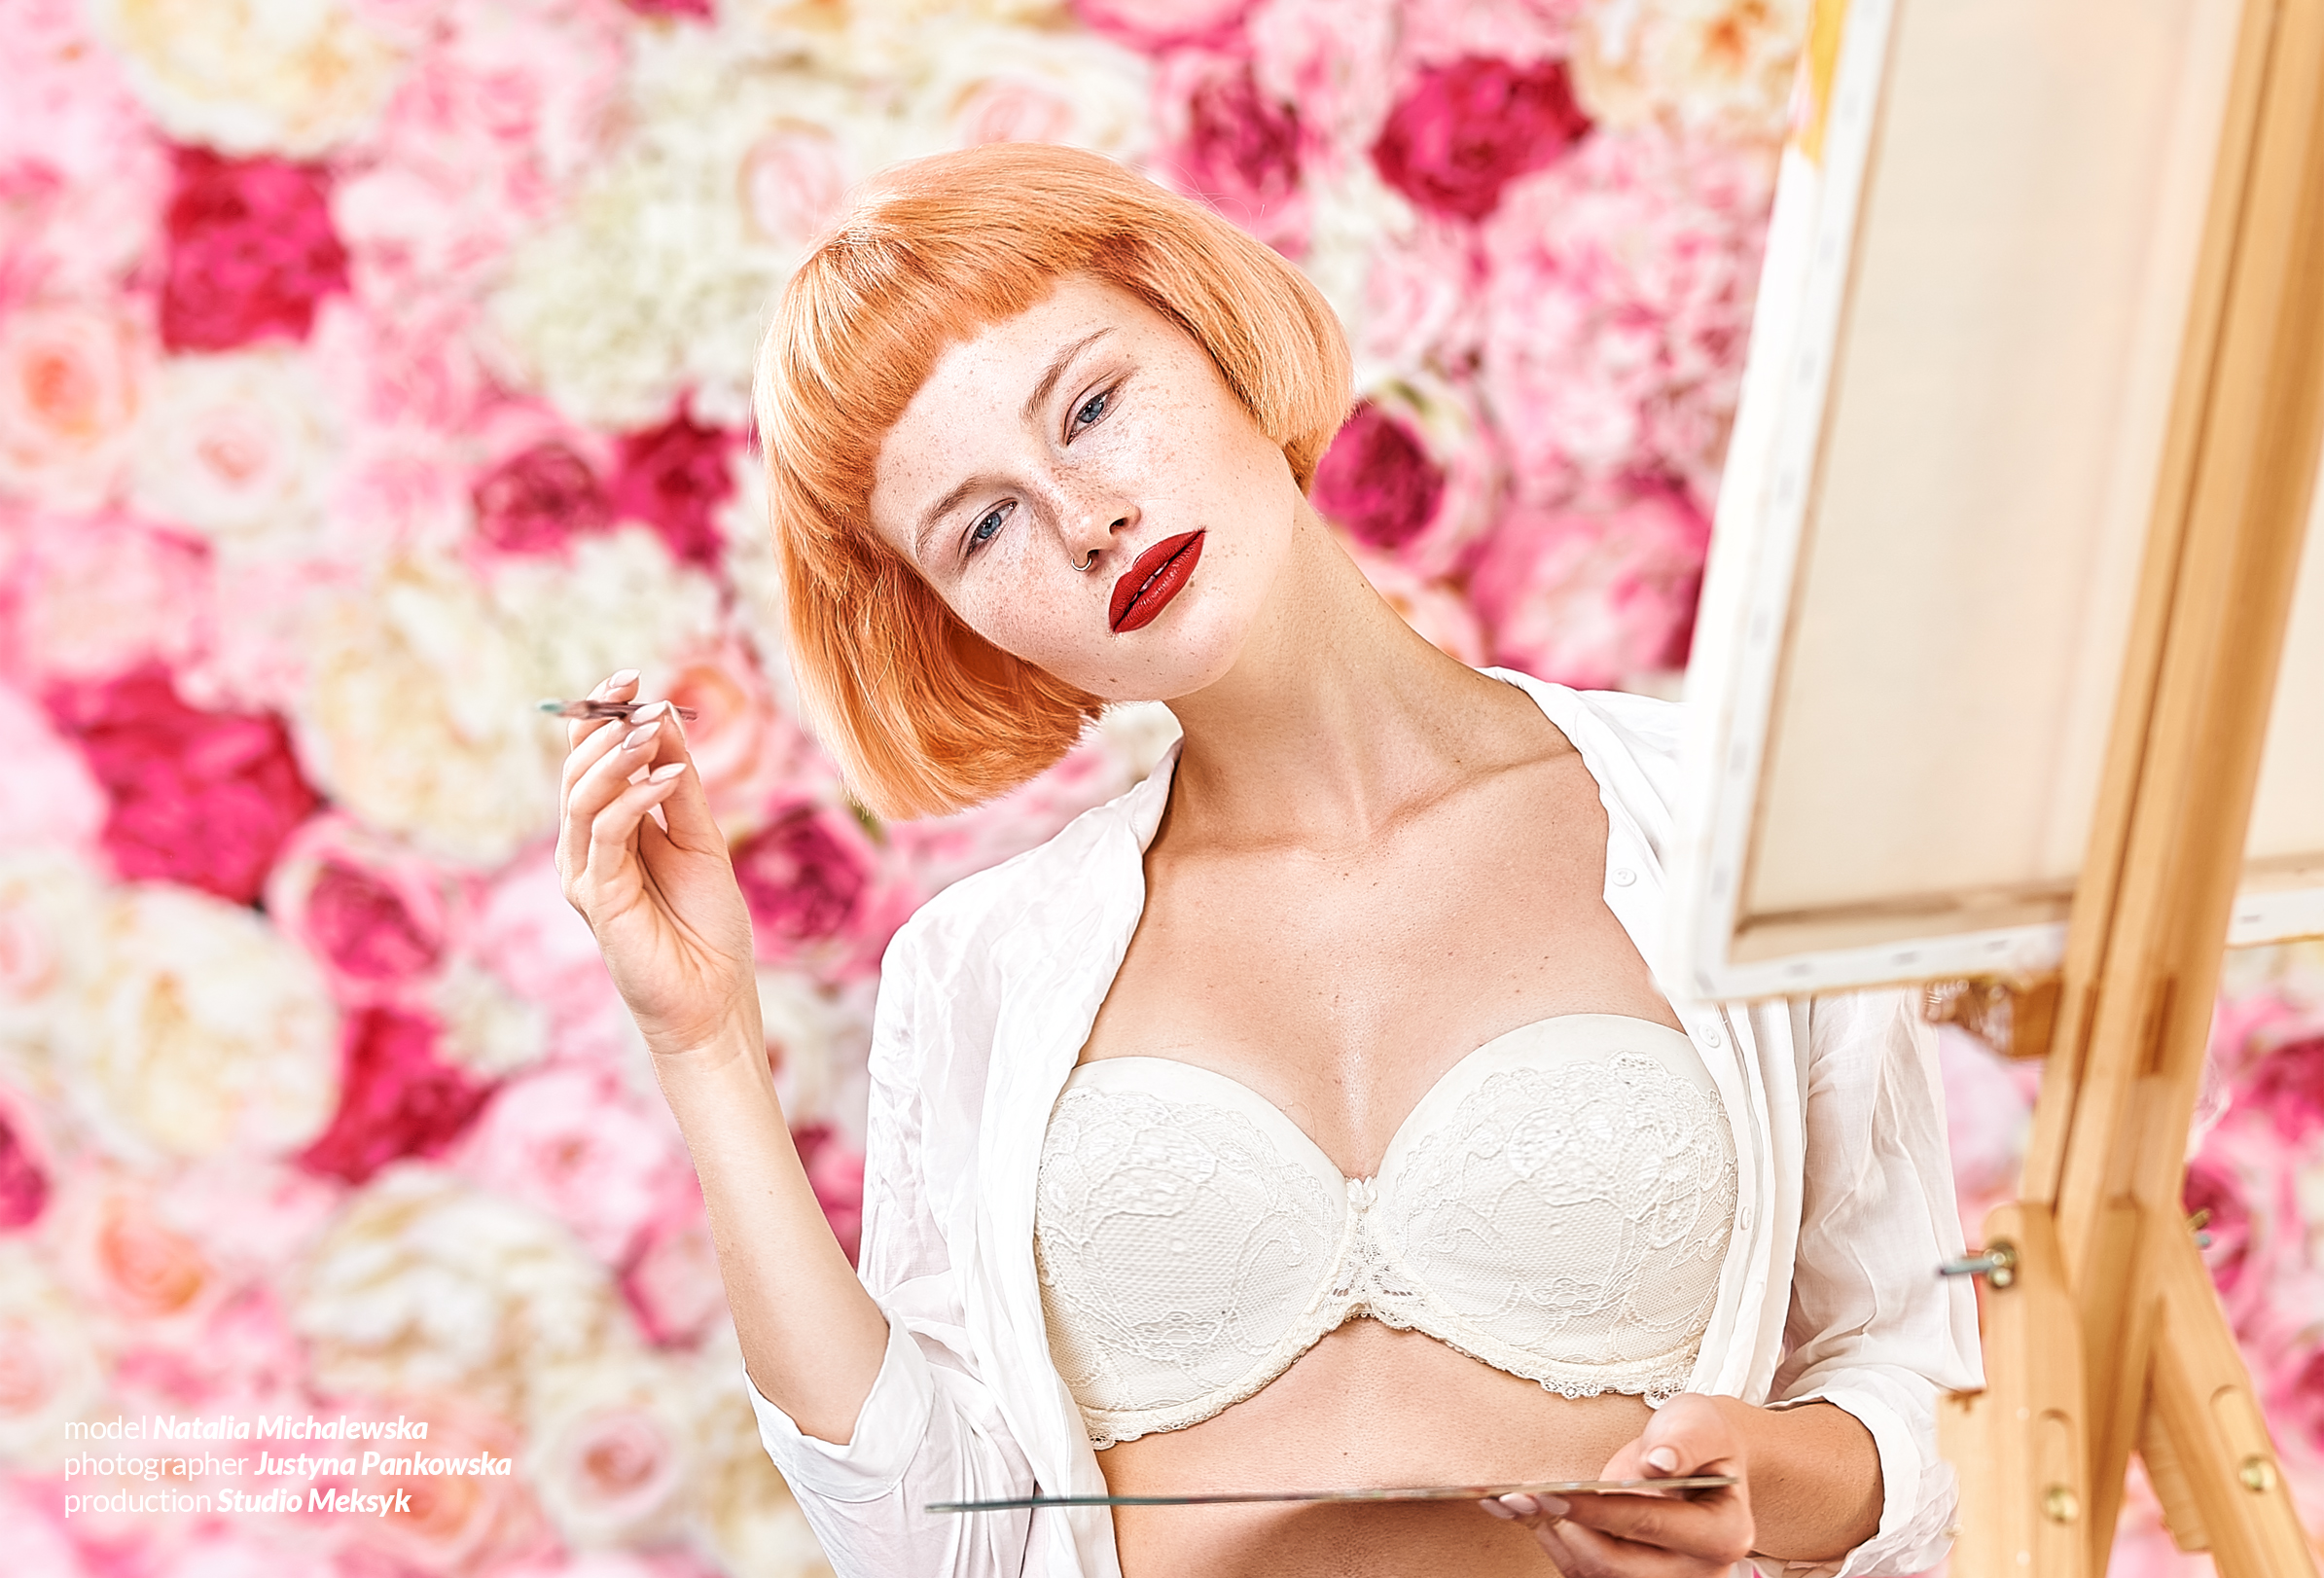 Natalia Michalewska, rose, glamour, warszawa, zdjęcia, beauty, girl, freckles, natural, portrait, pro, retouch, photography, D4s, nikkor 105 macro, Justyna Pankowska, Studio Meksyk,4a.jpg